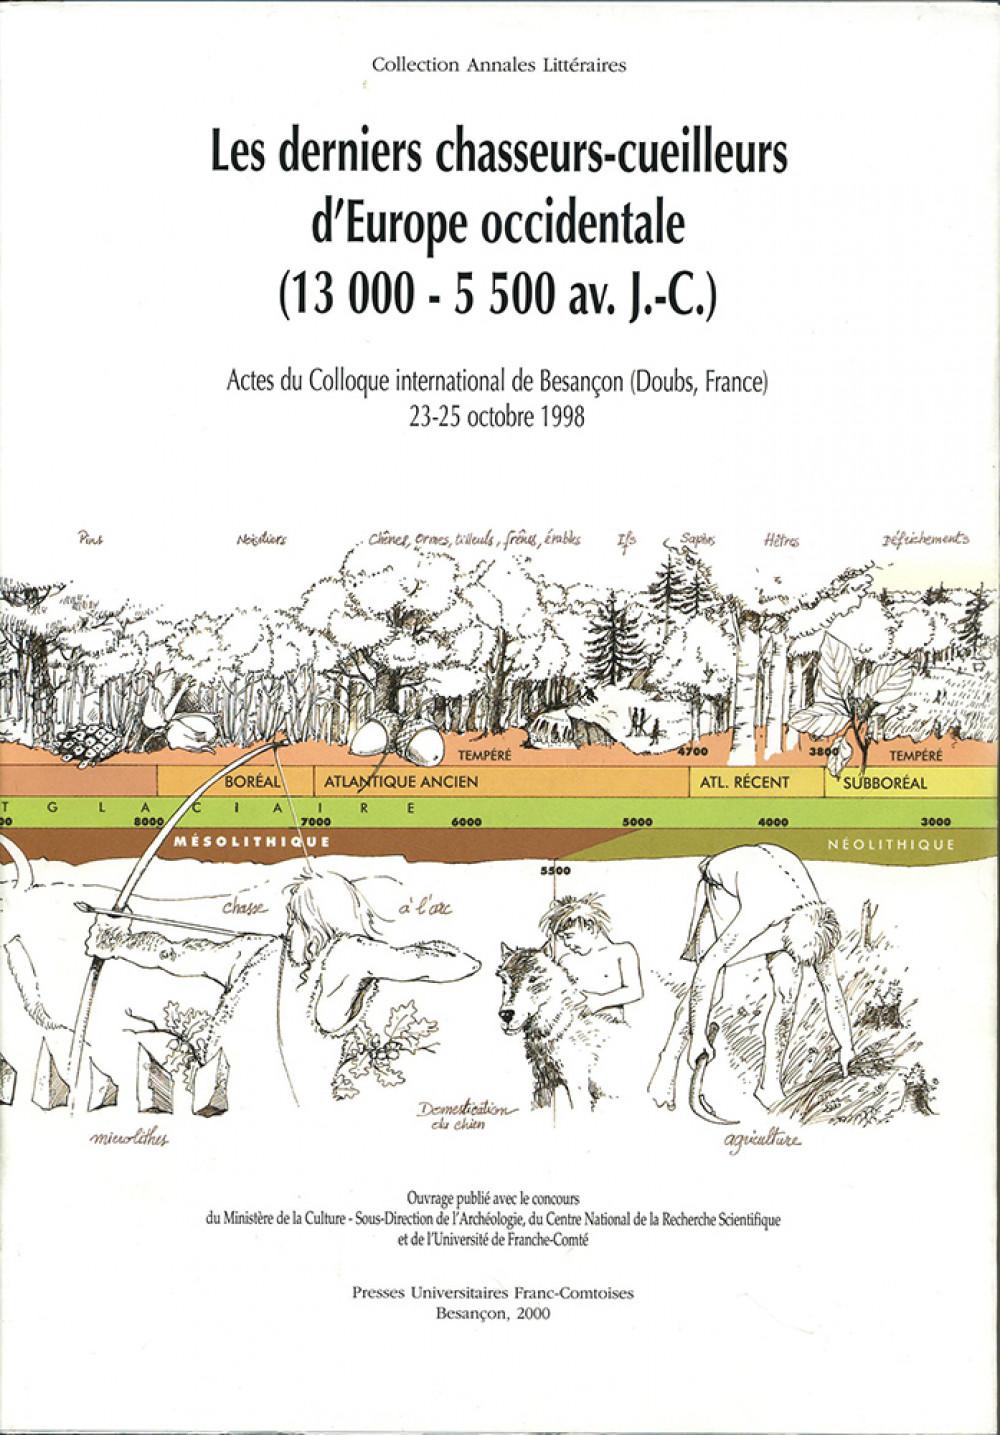 Les derniers chasseurs-cueilleurs d'Europe occidentale (13000-5500 av. J.-C.)